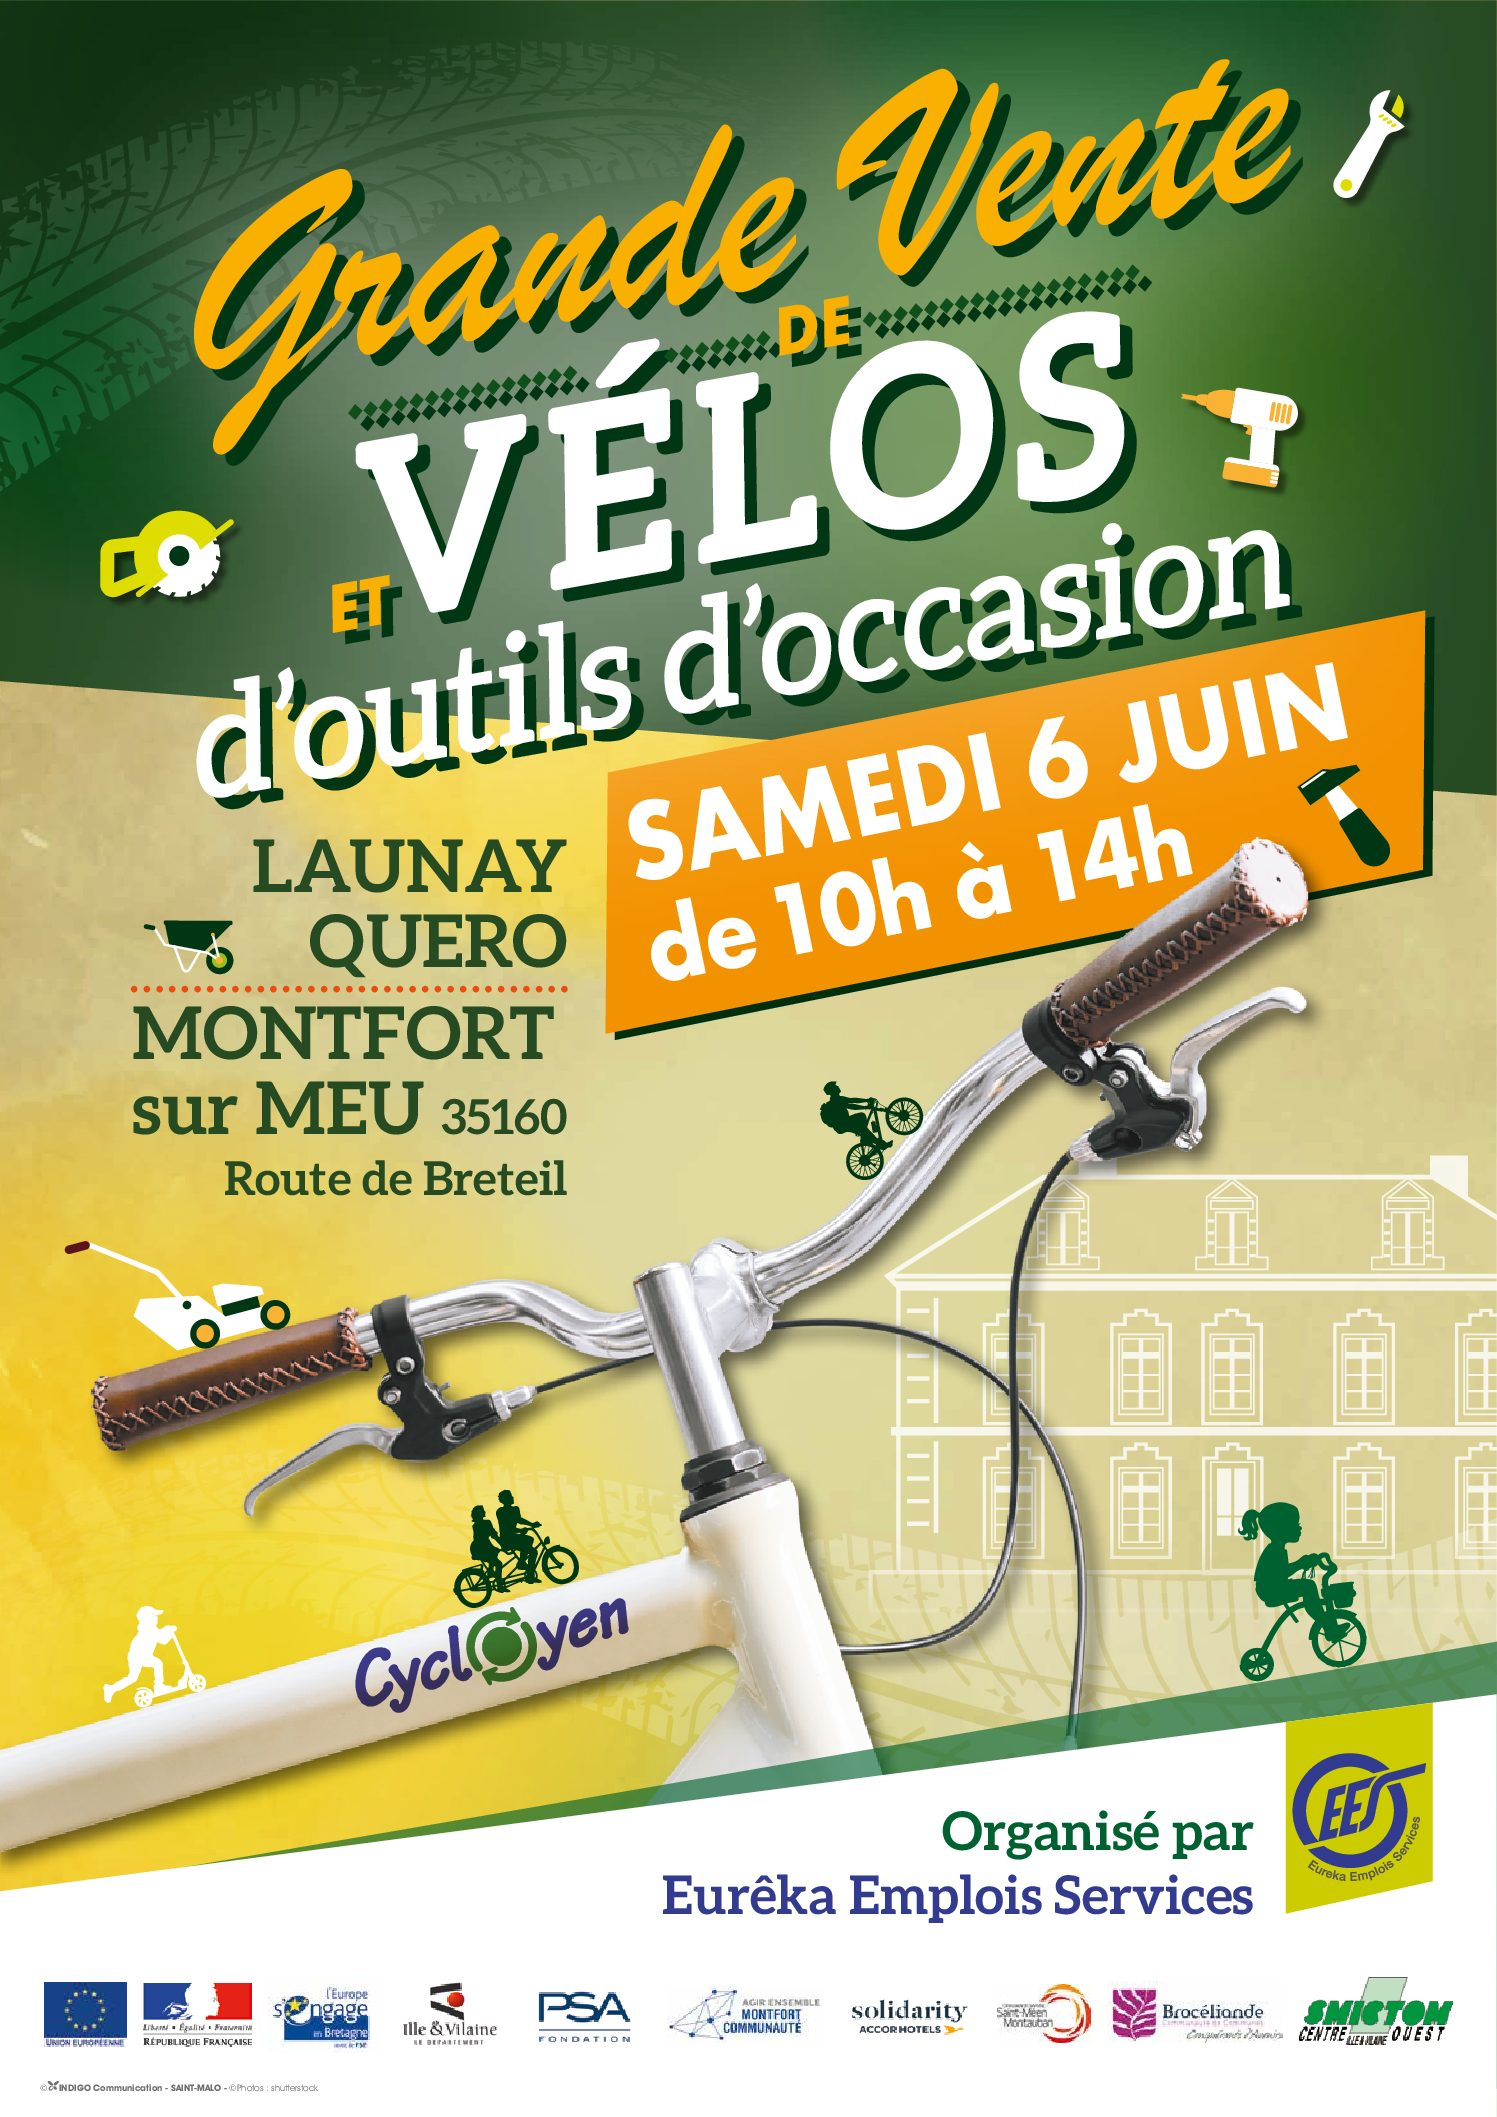 Grande vente de vélos «CYCLOYEN» et d'outils d'occasion